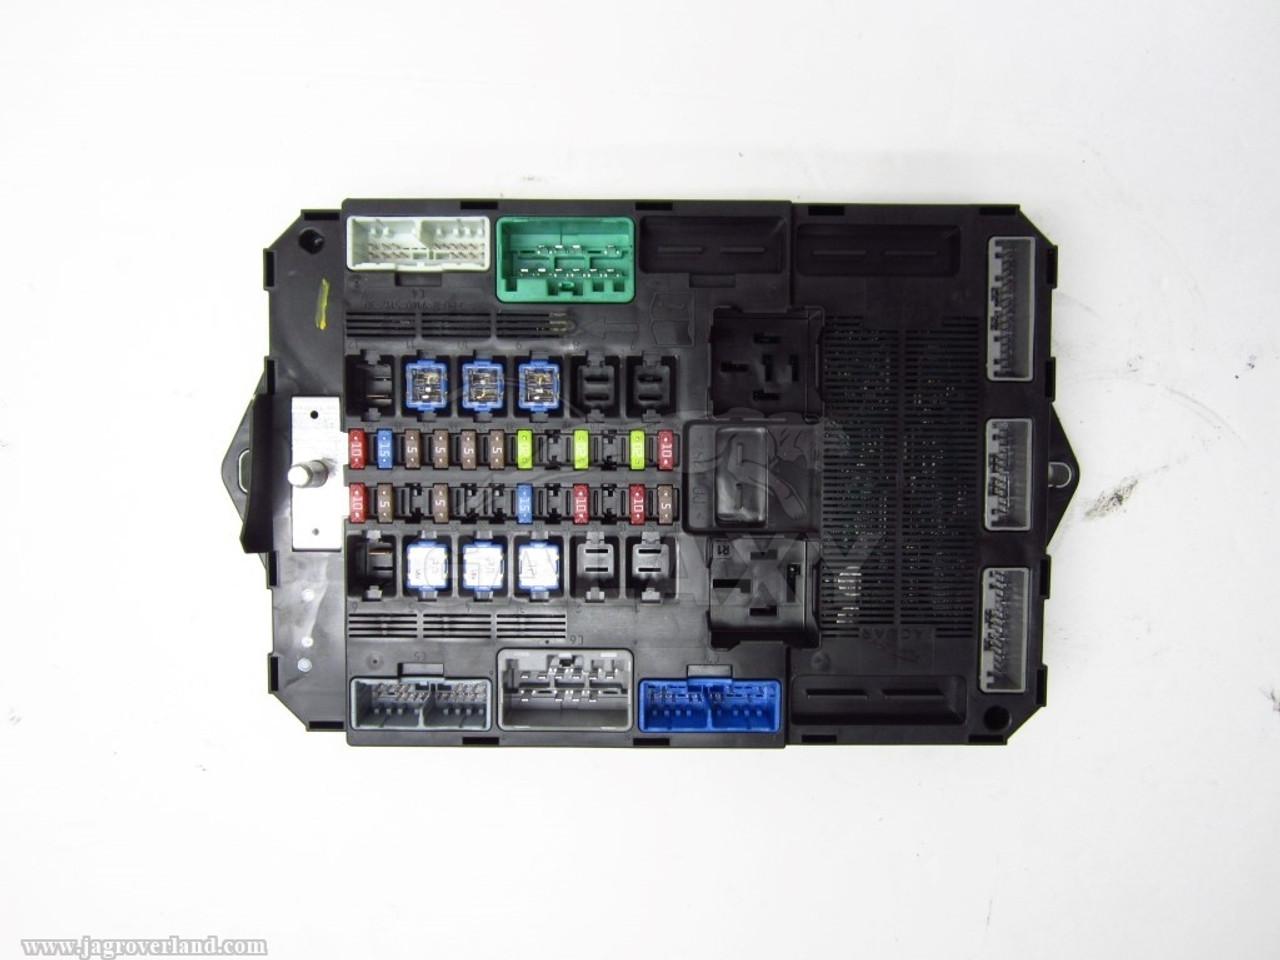 12 Xf Xfr Trunk Fuse Box Smart Junction Oem C2Z23345 Cx23-14B476-Ag Oem Fuse Box on